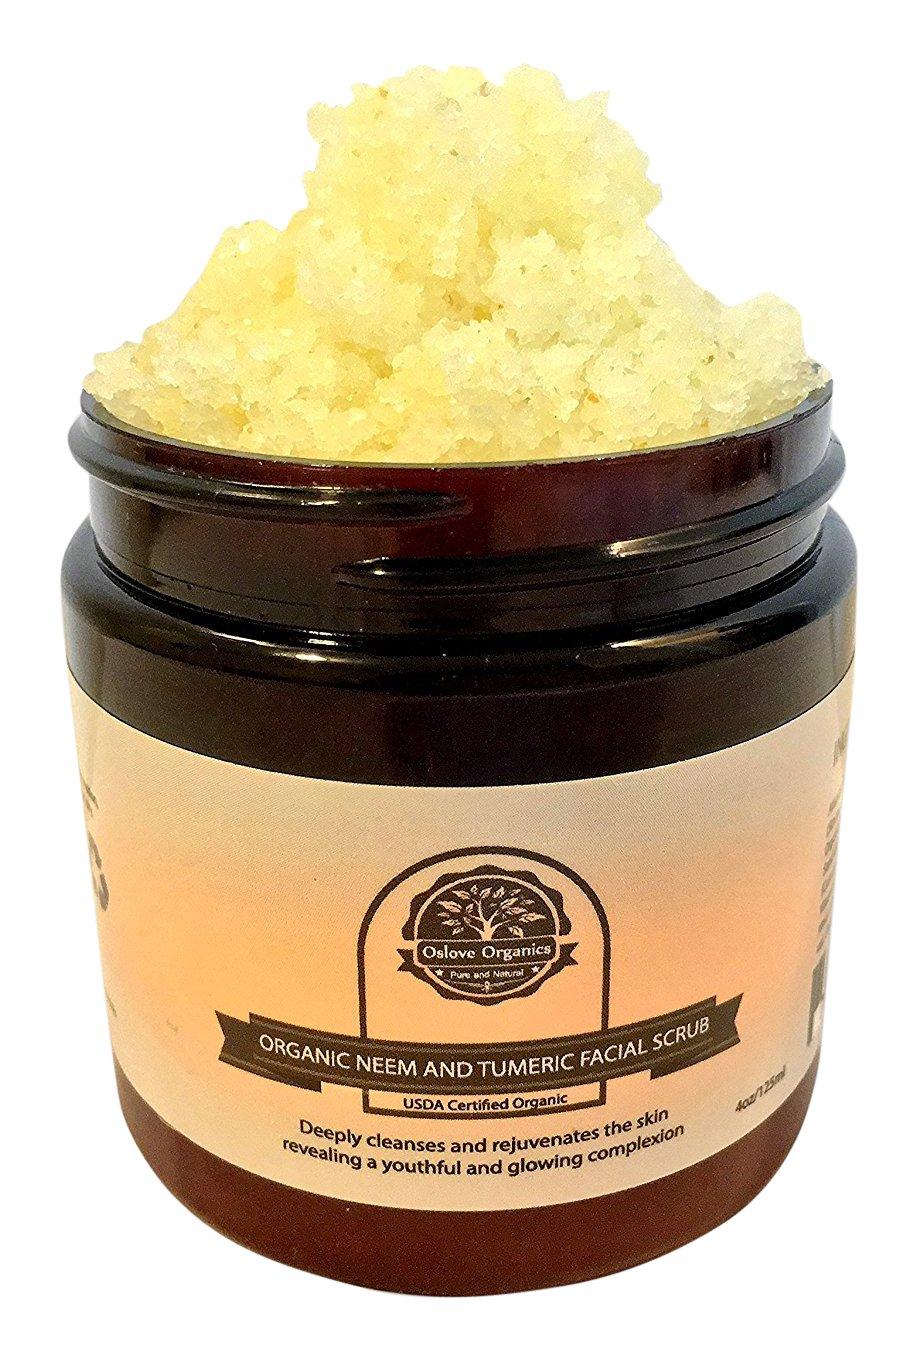 Oslove Organics Organic Neem and Tumeric Facial Scrub, 4 Oz Oslove 010